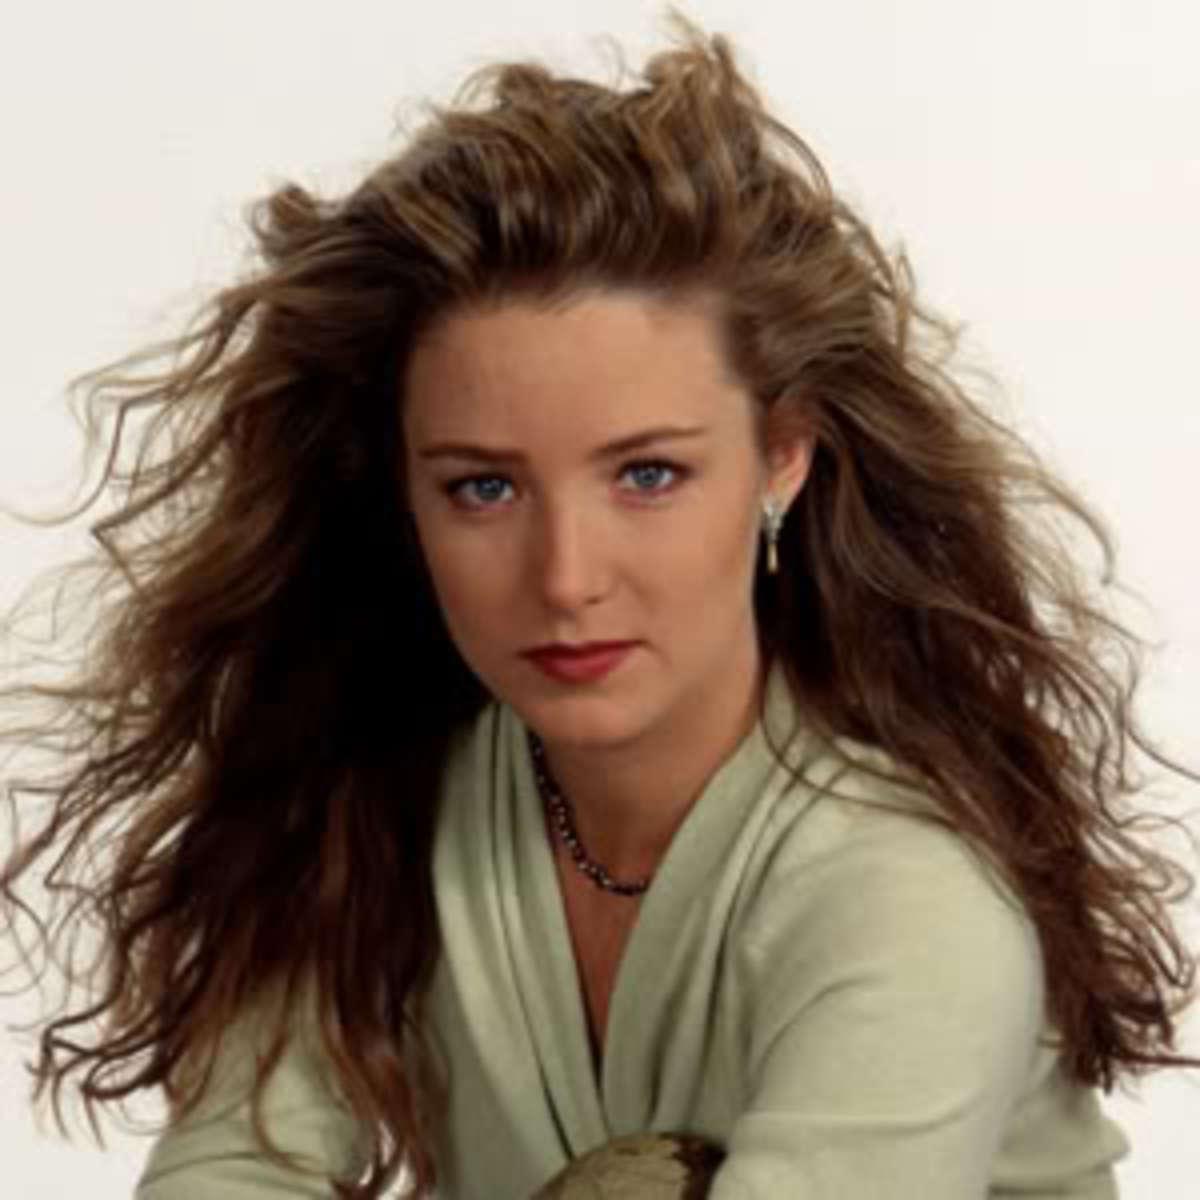 Arianne Zucker born June 3, 1974 (age 44) recommendations